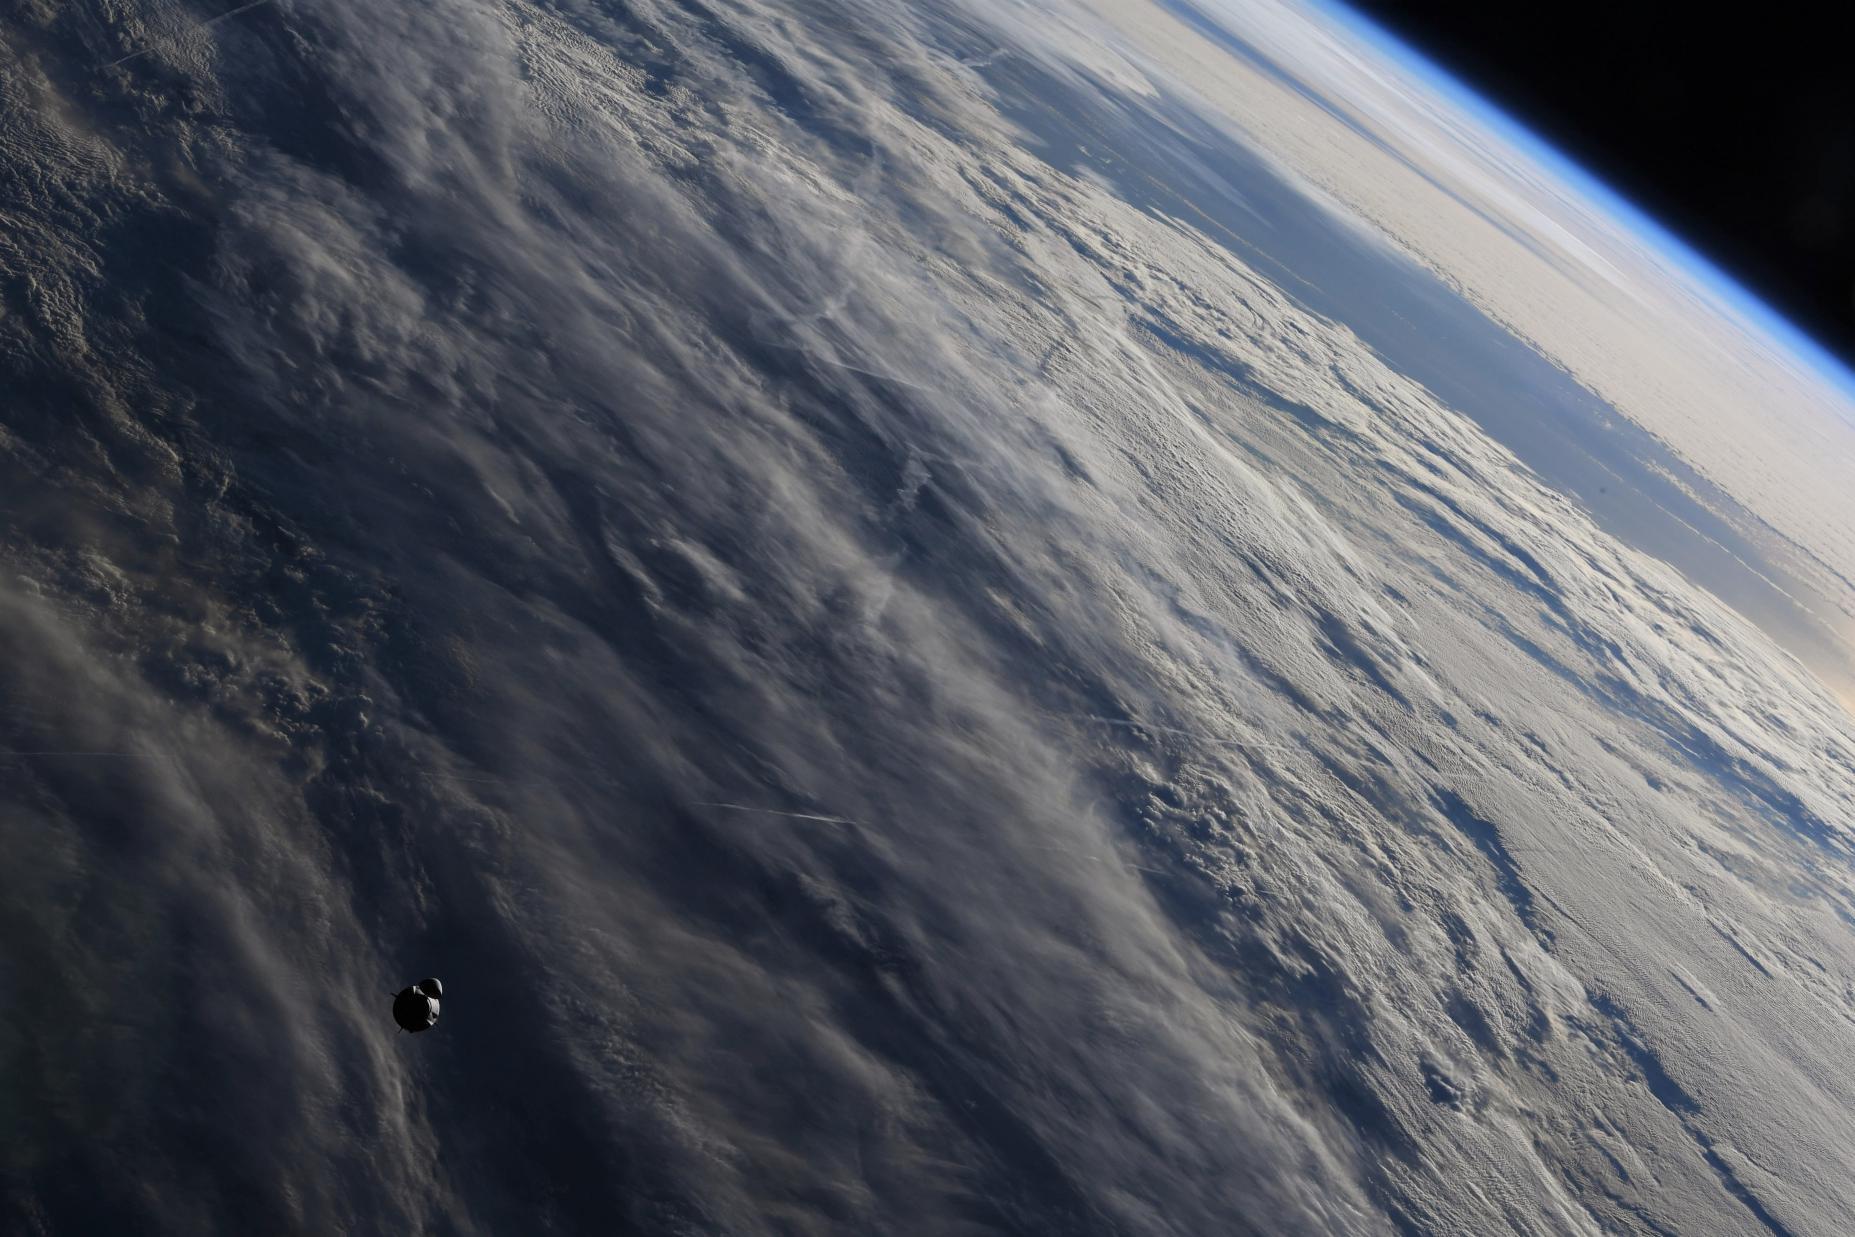 Crew-2 Crew Dragon C206 orbit ops 042421 (NASA) ISS arrival 2 (c)